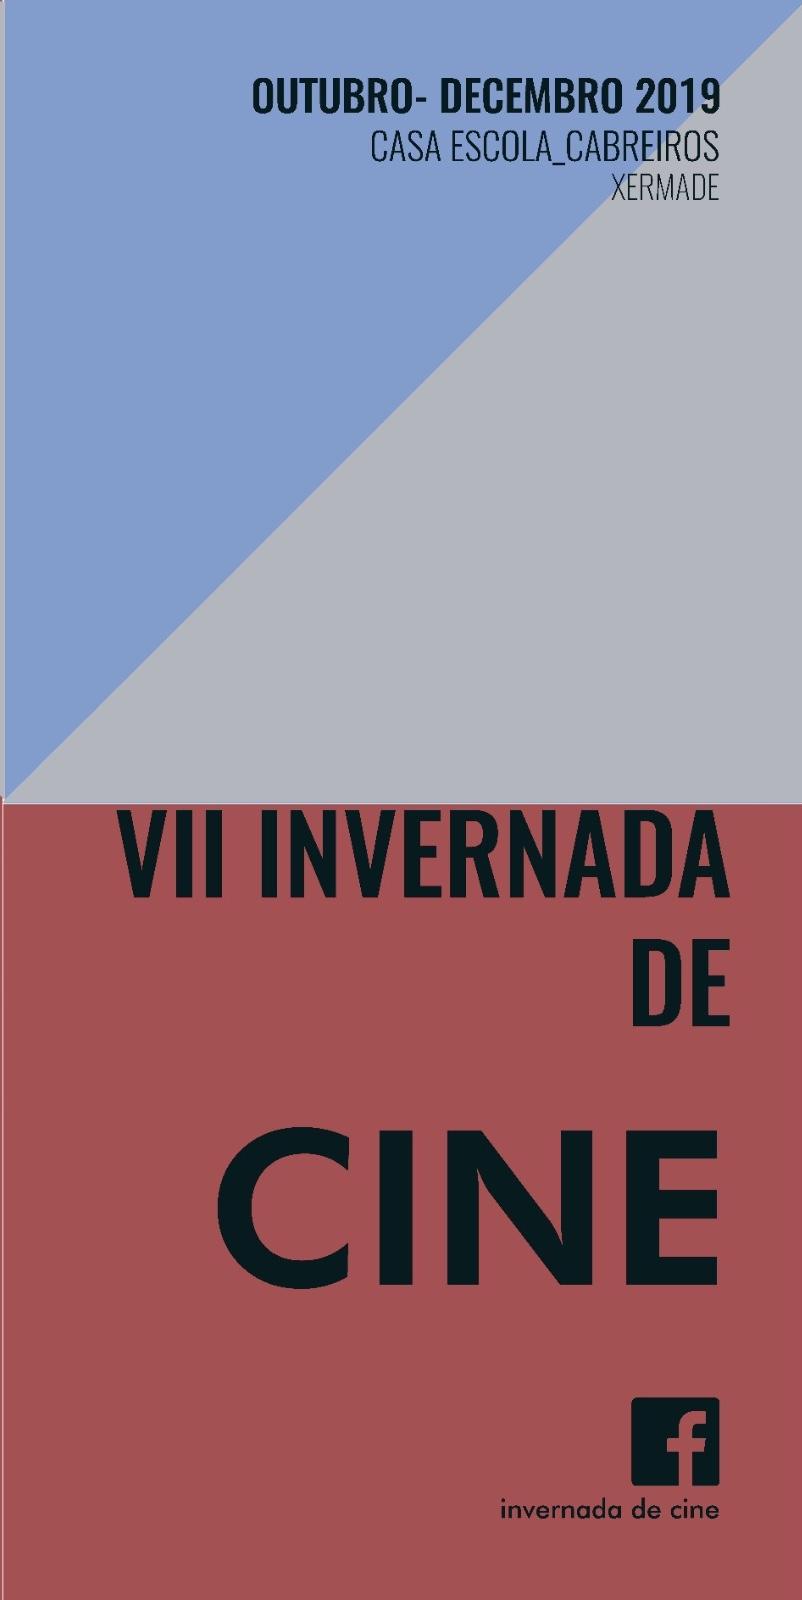 Vll INVERNADAS DE CINE 2019